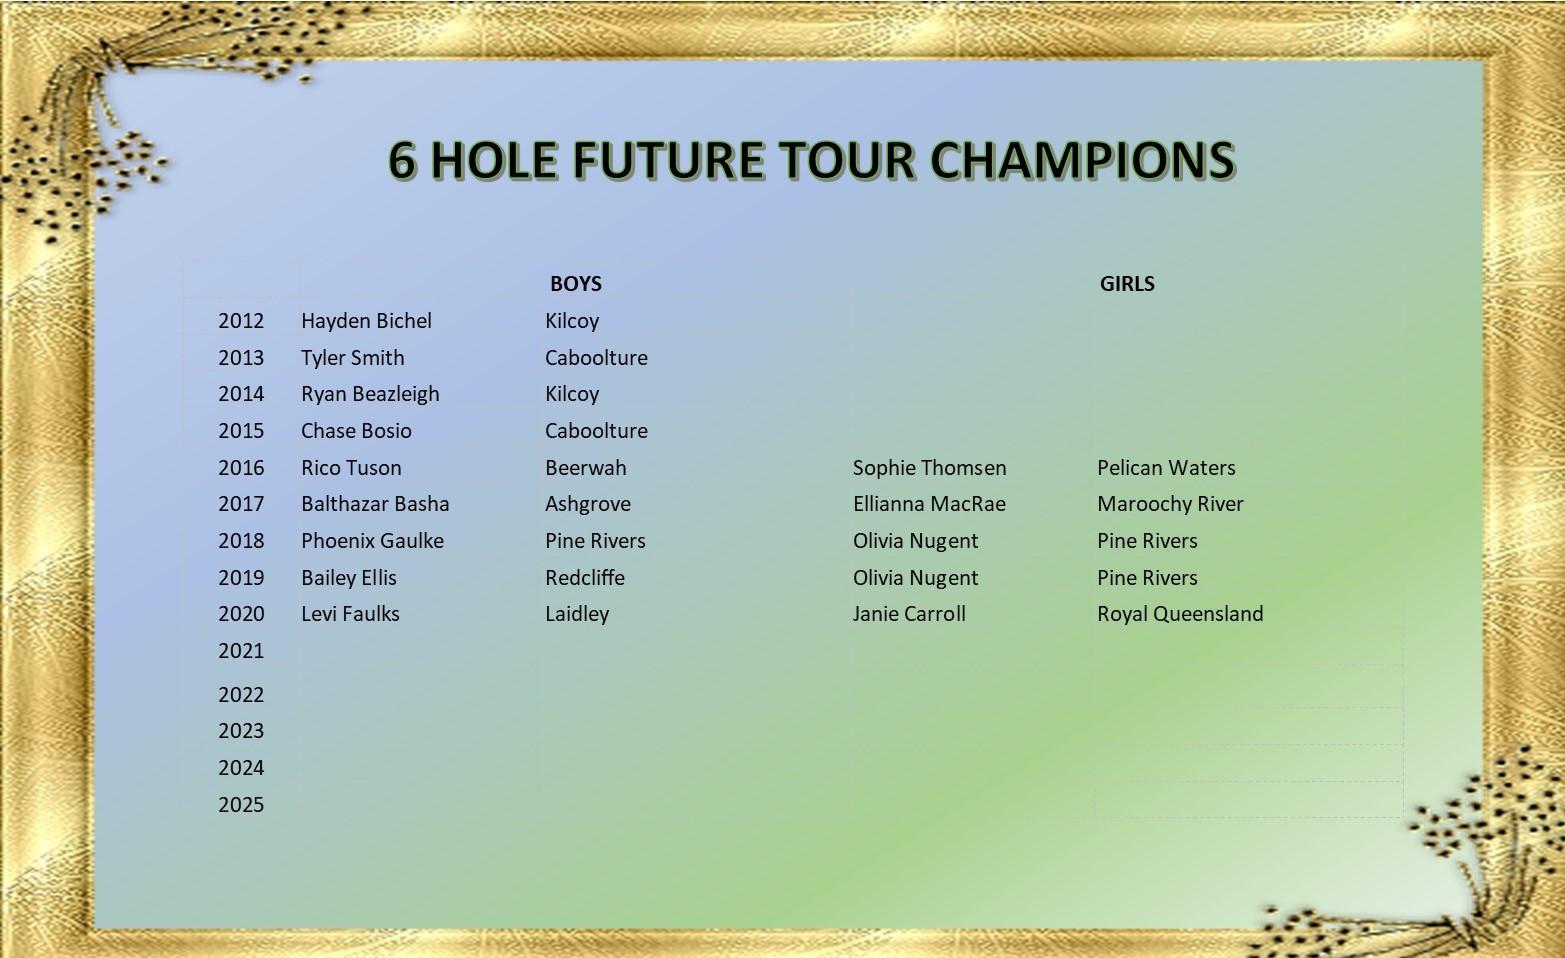 6 Hole Champions.jpg